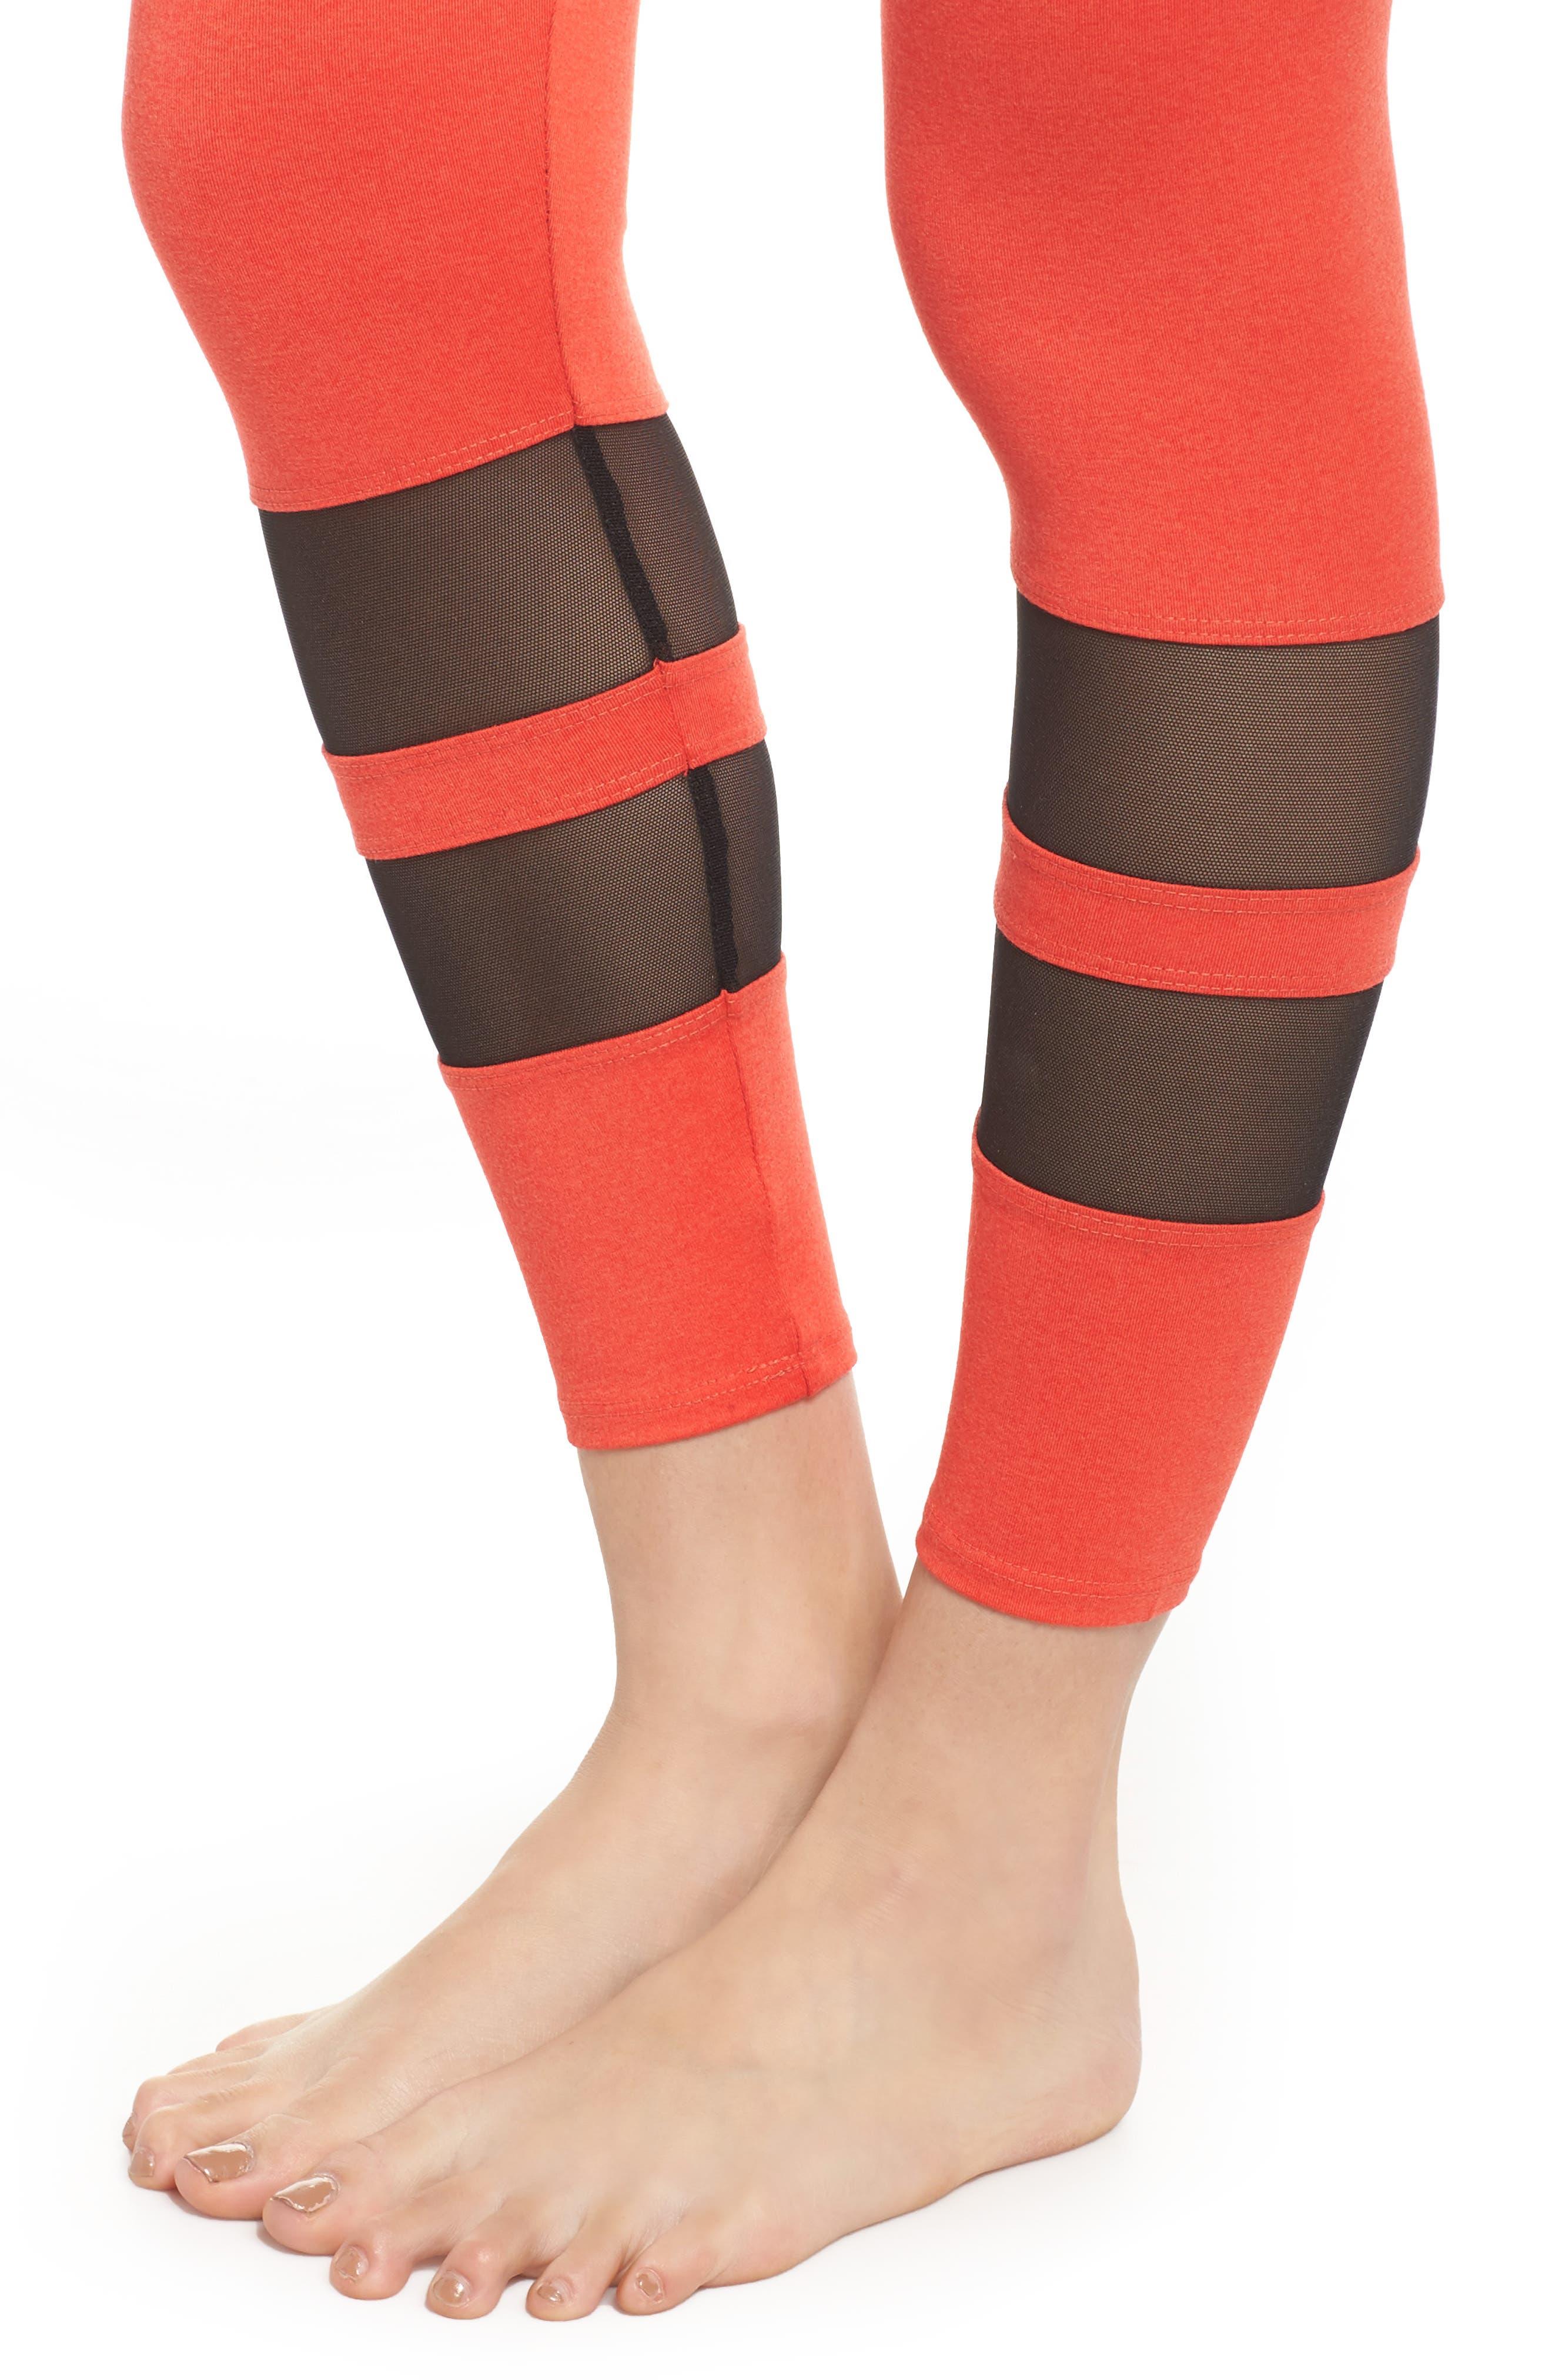 Racer Leggings,                             Alternate thumbnail 4, color,                             Coral Majestic/ Black Mesh